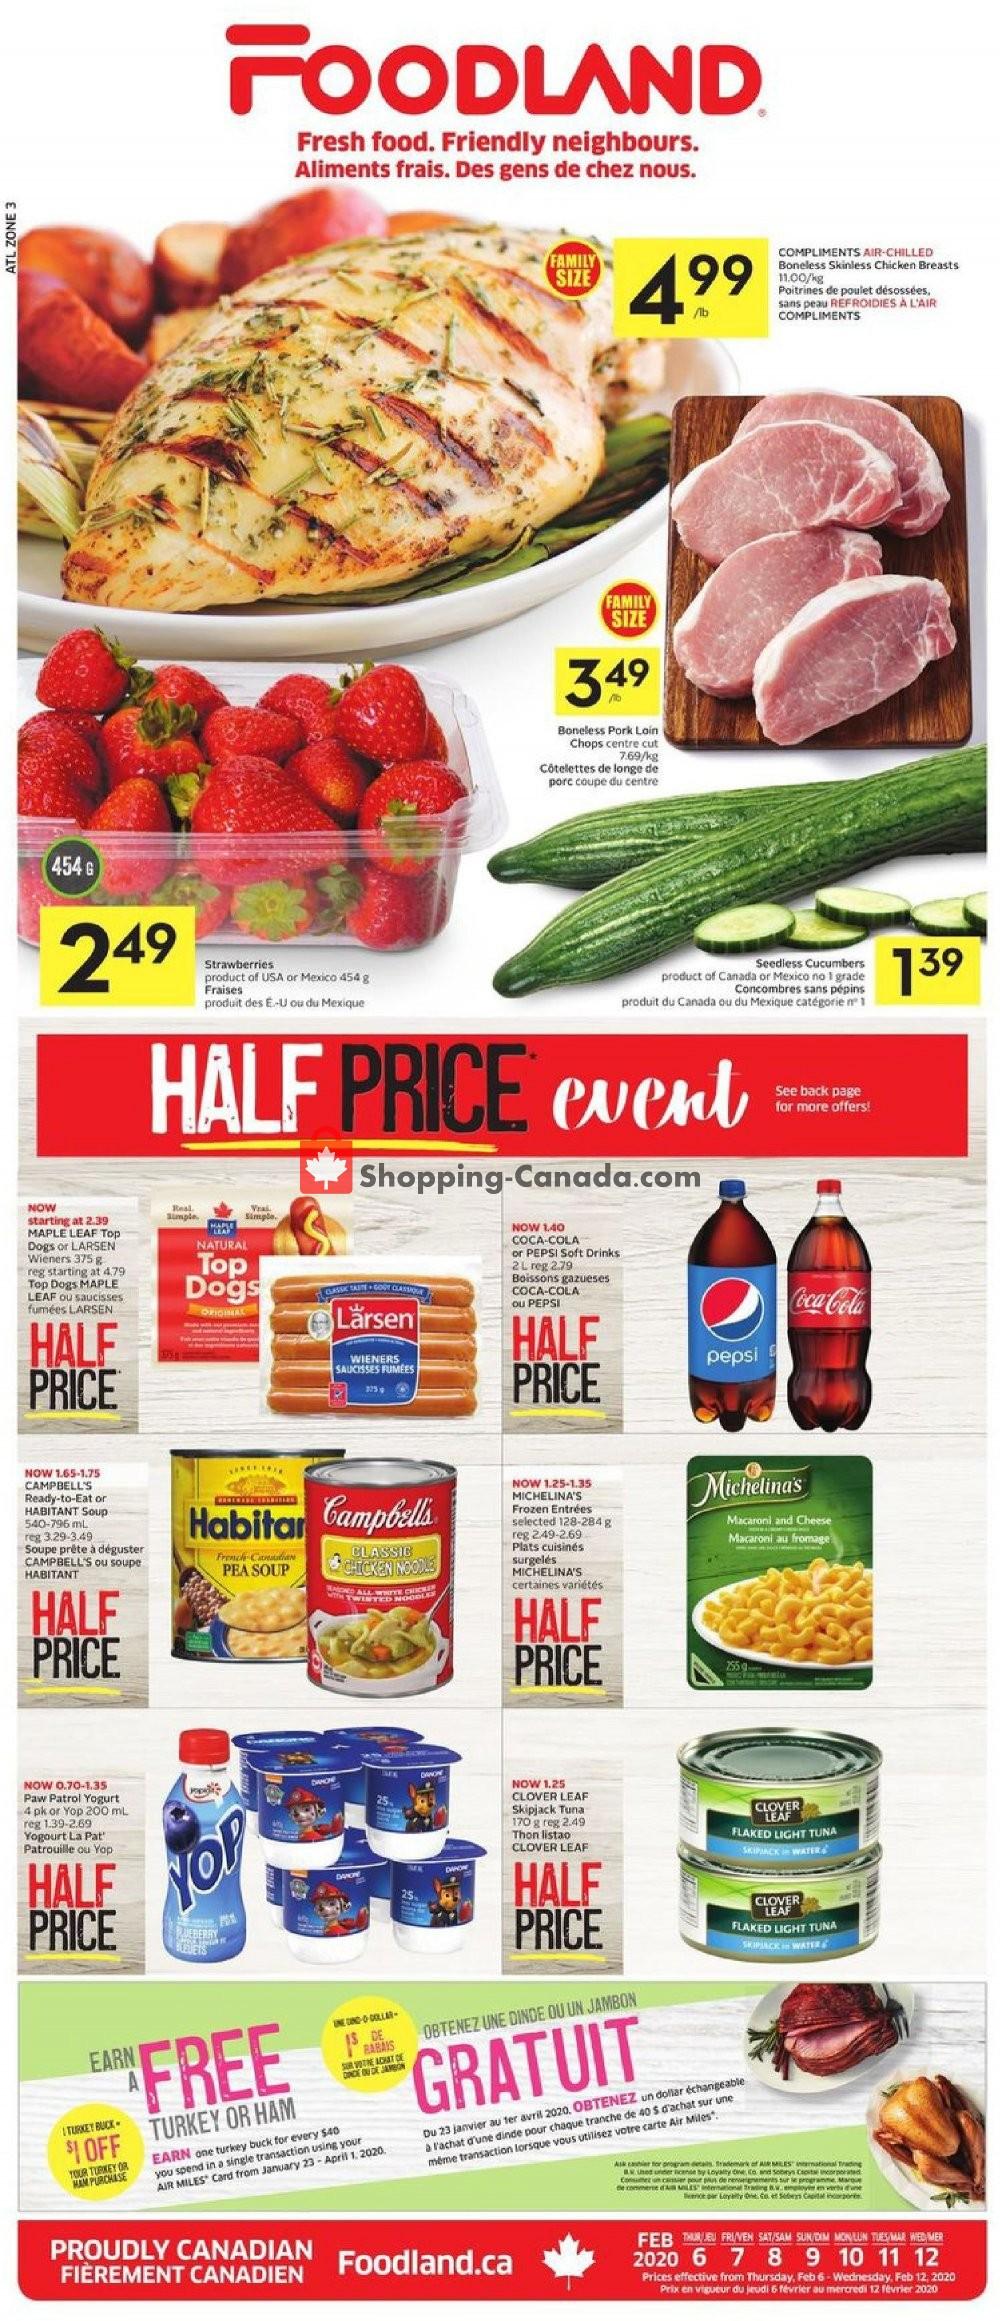 Flyer Foodland Canada - from Thursday February 6, 2020 to Wednesday February 12, 2020